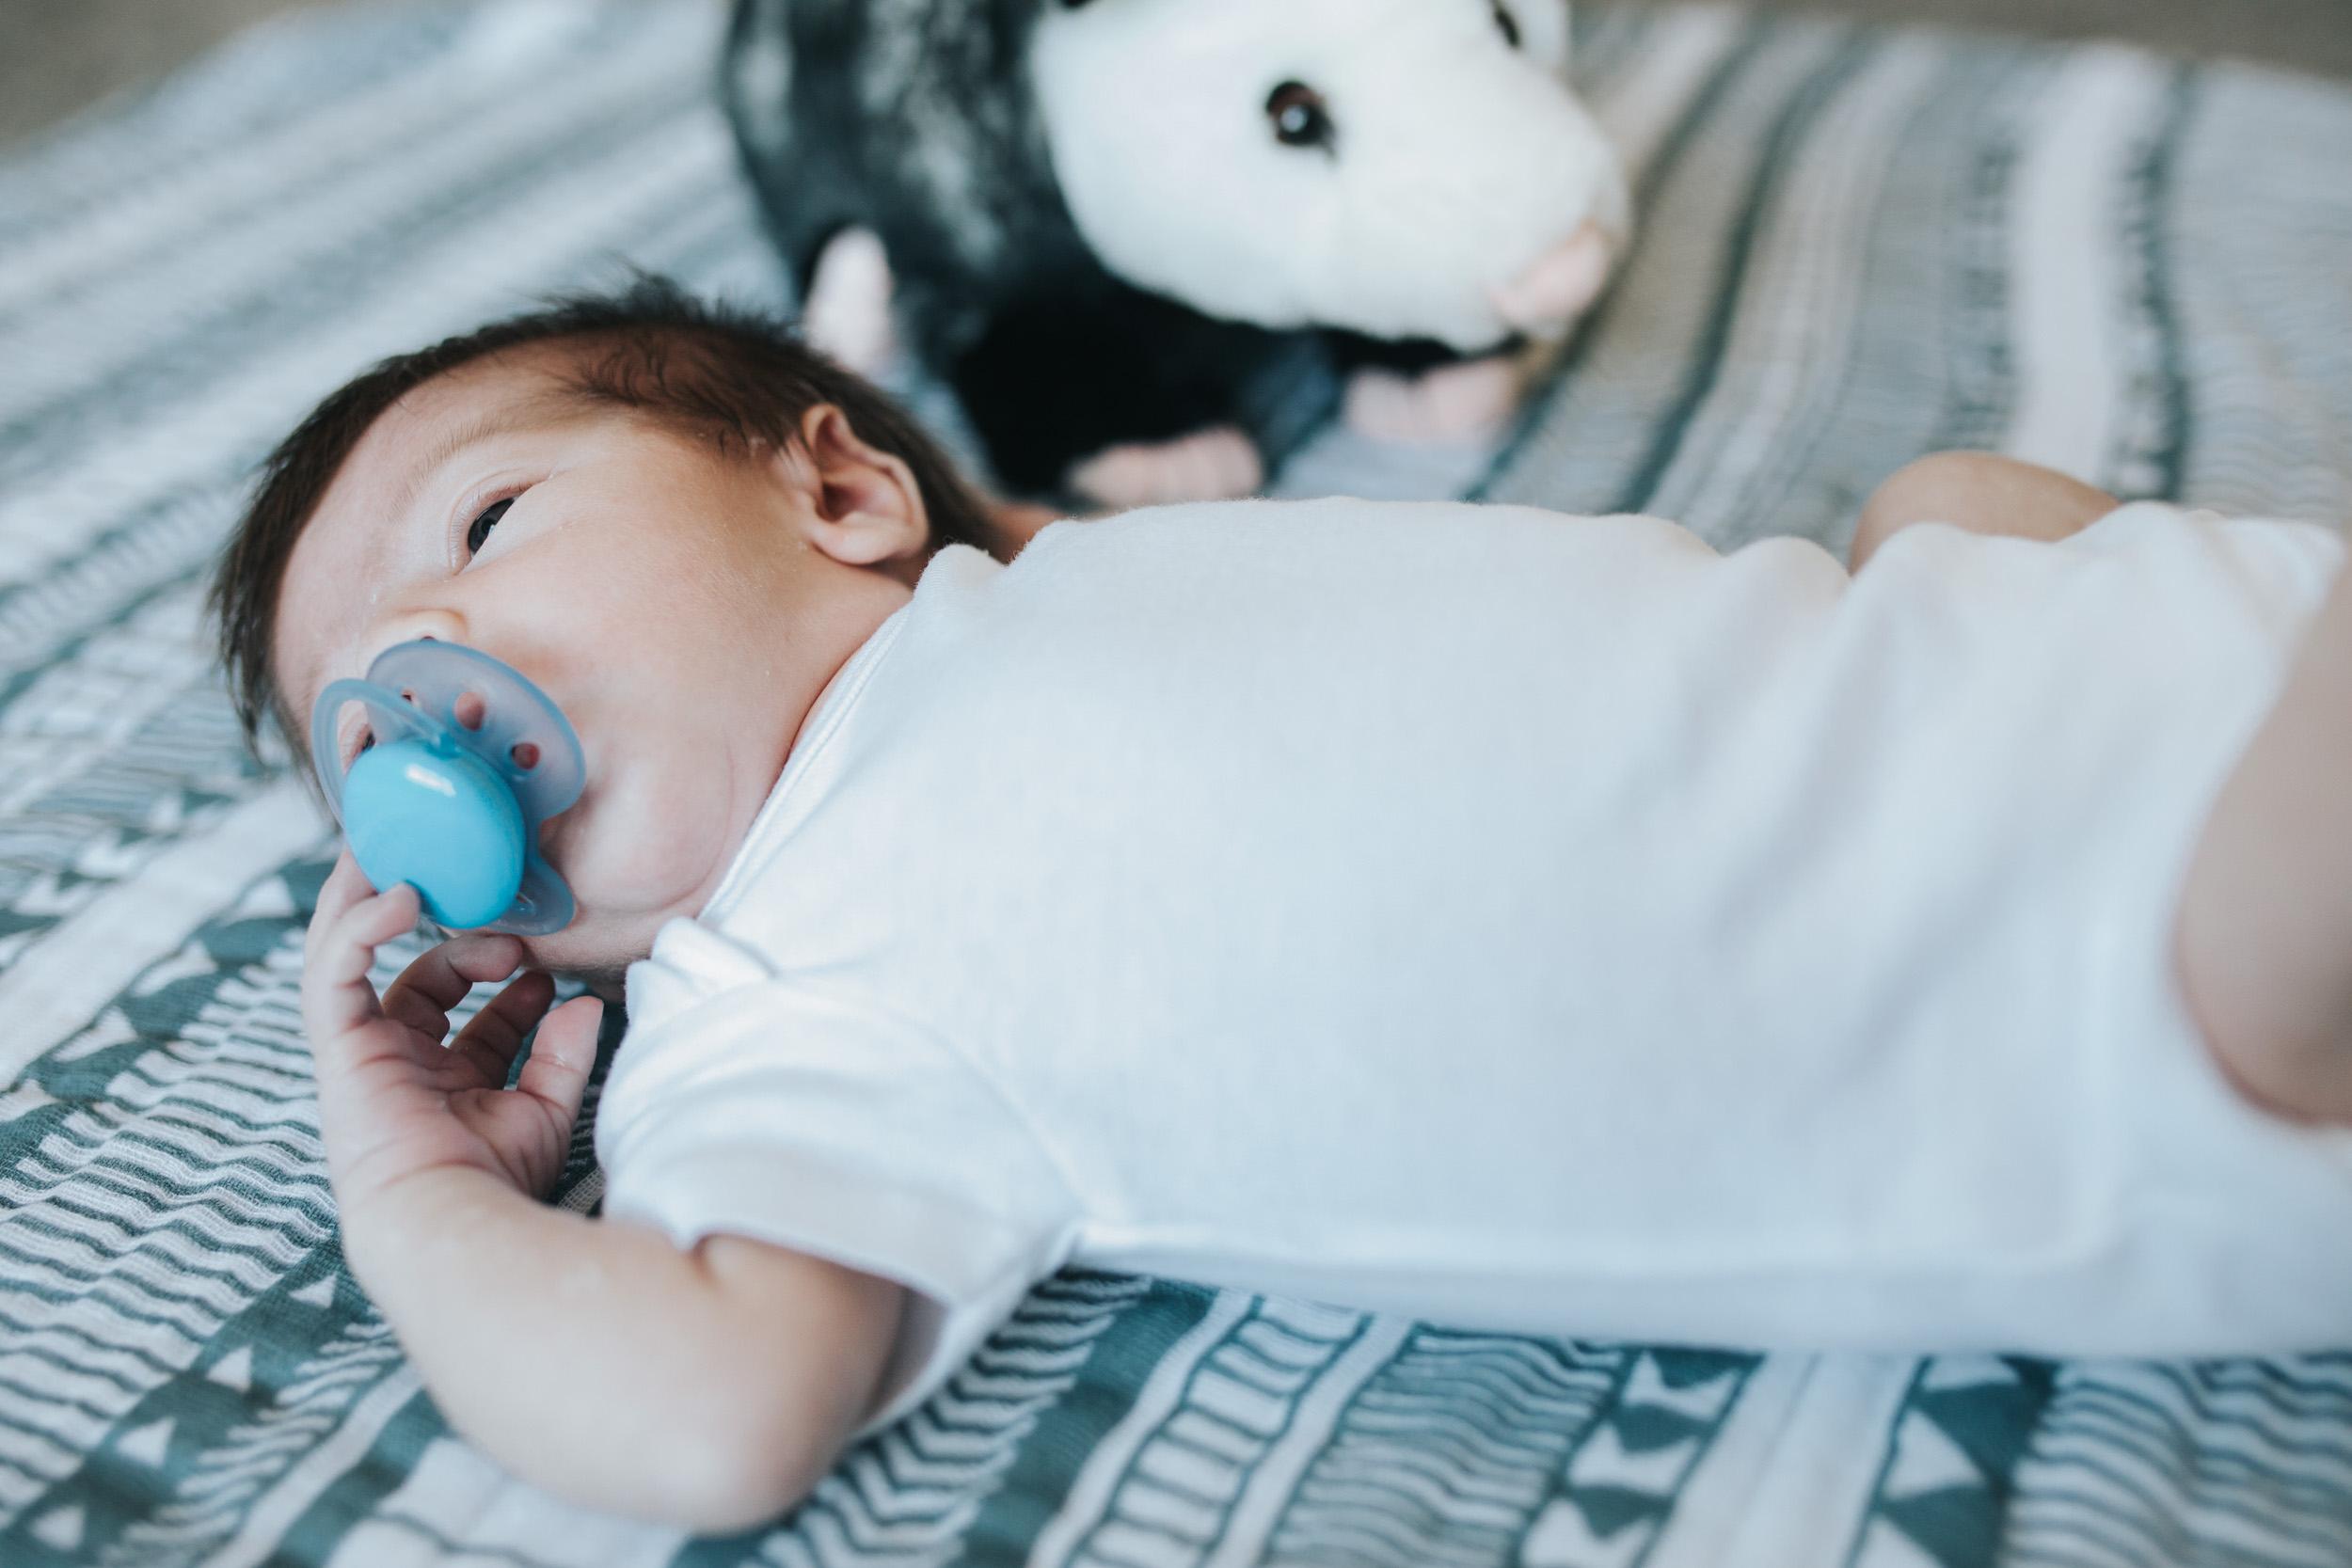 StephenPaynePhotography_BabyTaylor-1.jpg